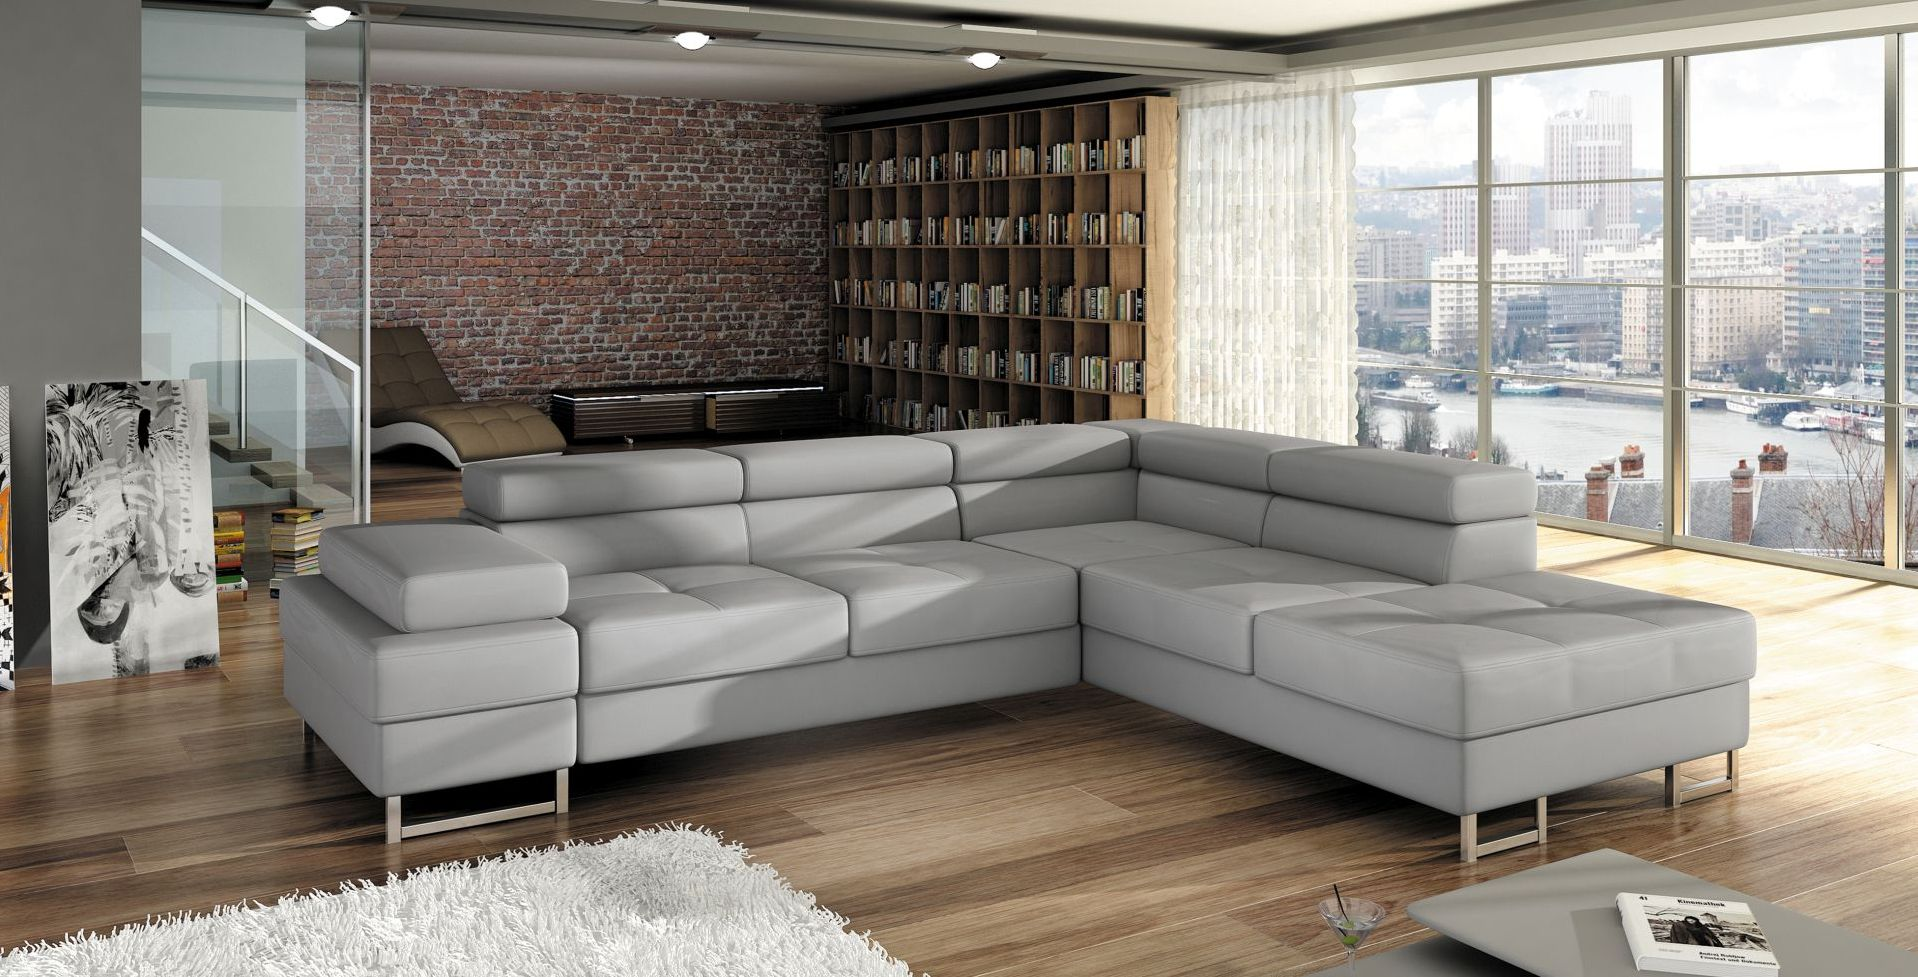 sofa schlafsofa designer sofa mit bettfunktion bettkasten ecksofa couch neu tunis www. Black Bedroom Furniture Sets. Home Design Ideas